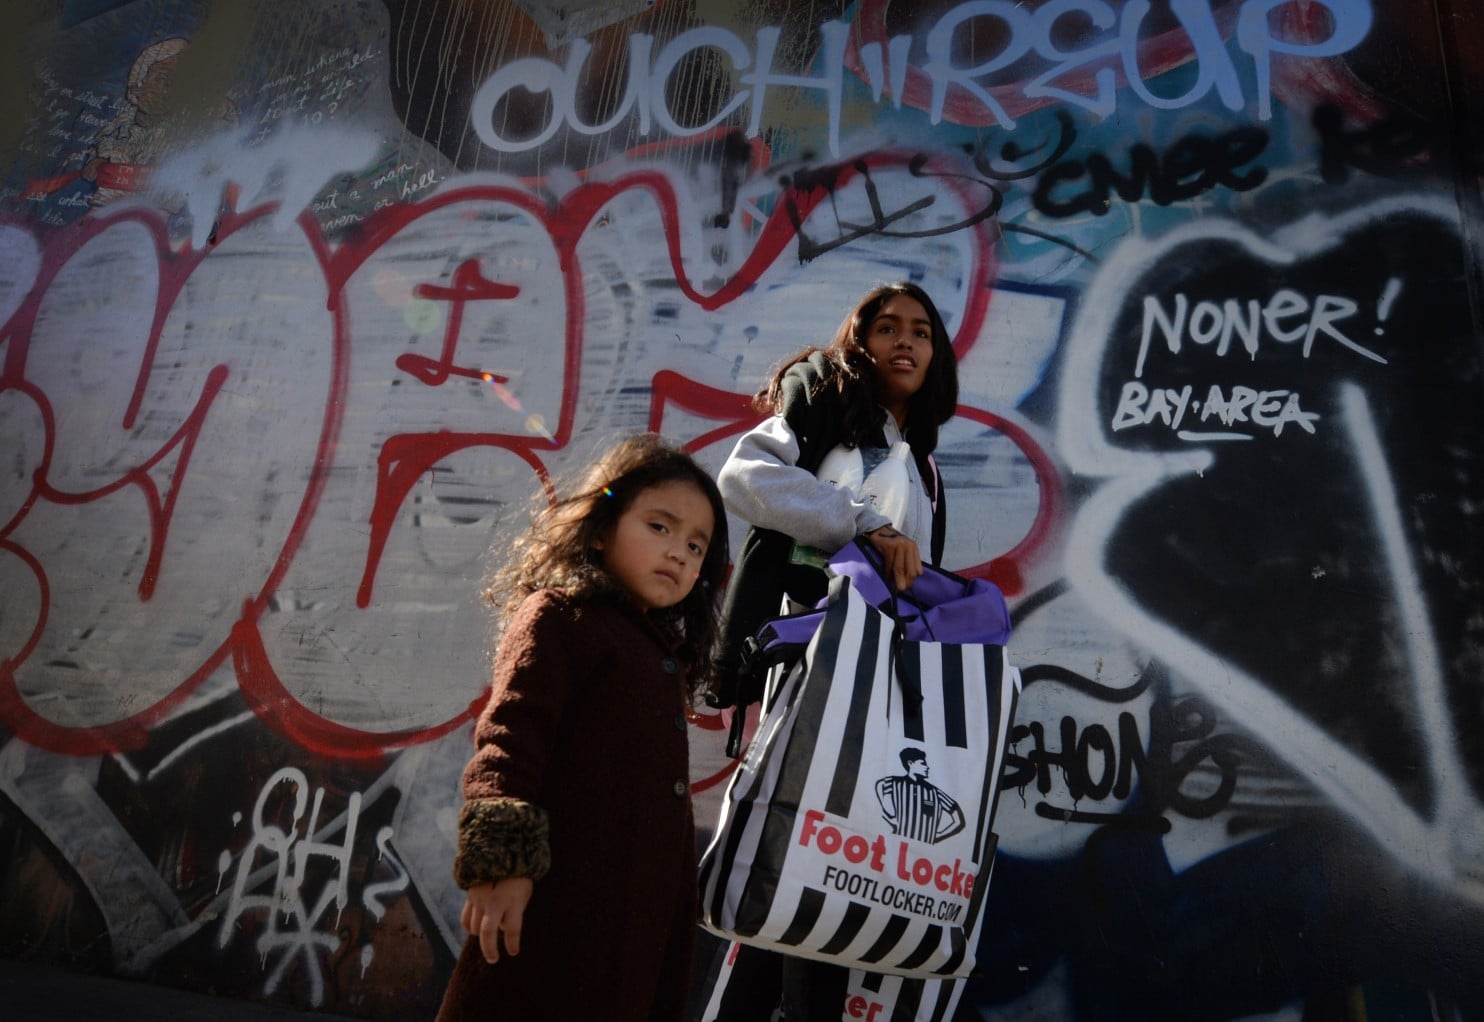 Majority of U.S. public school students are in poverty